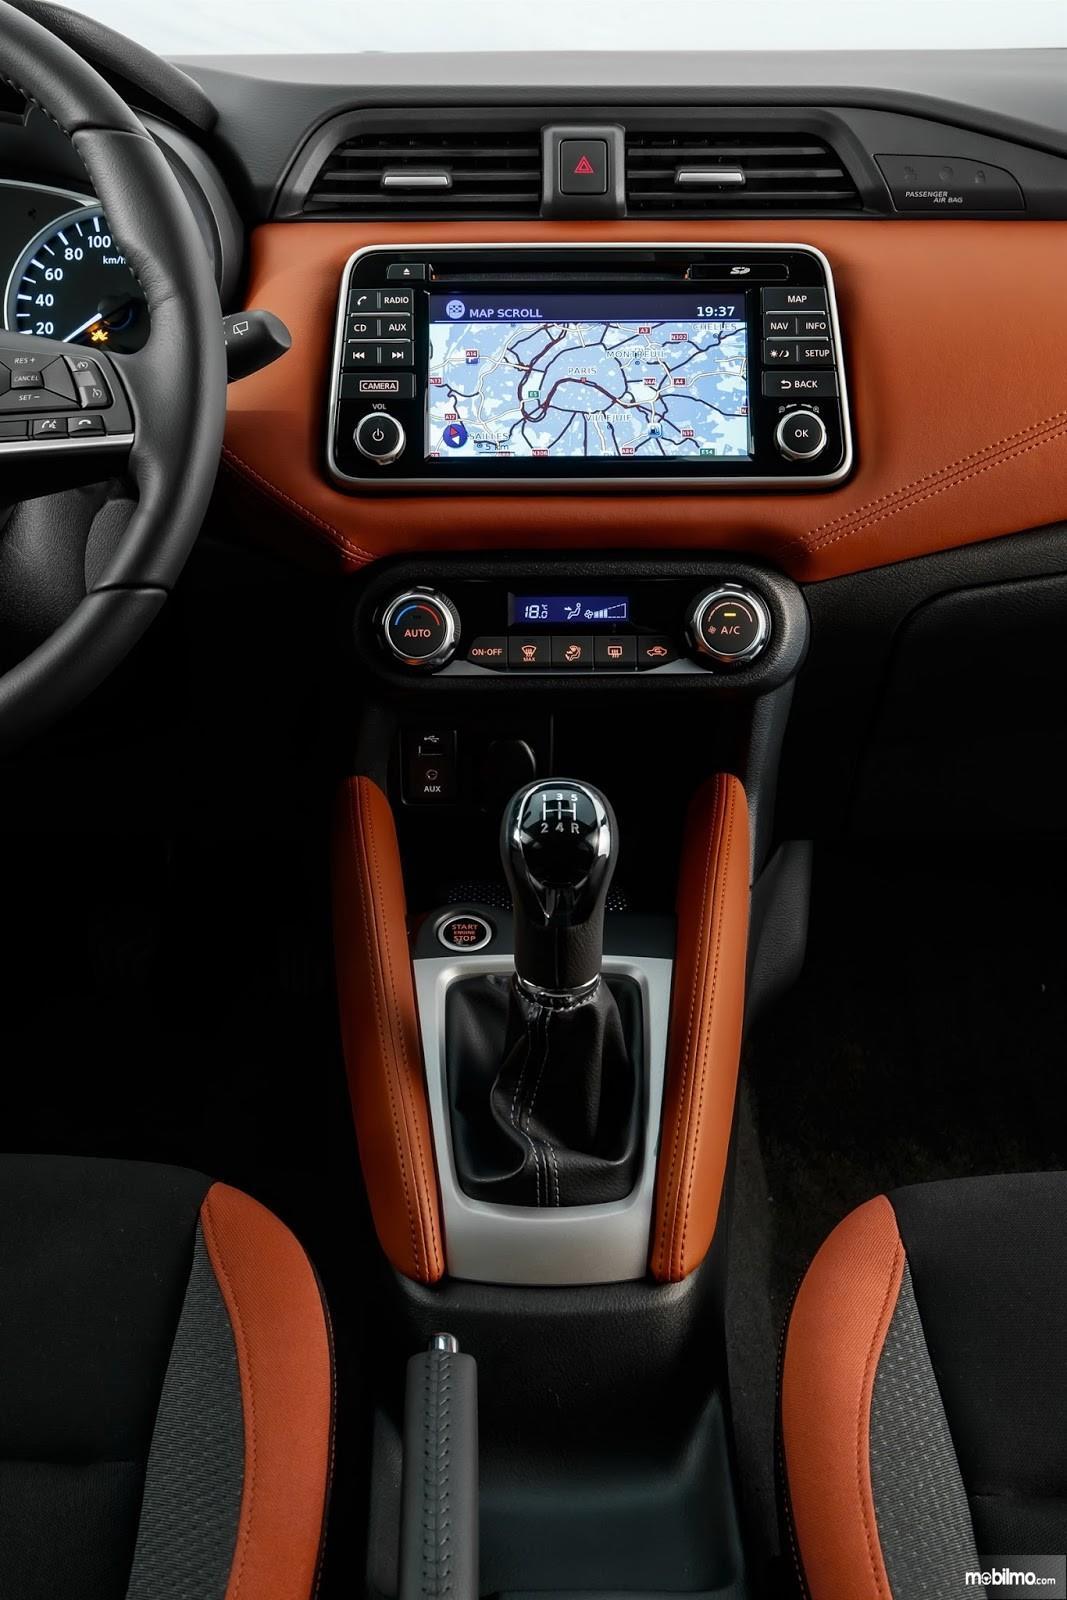 Gambar menunjukkan Head unit touchscreen 7 inchi pada sebuah Nissan March 2019